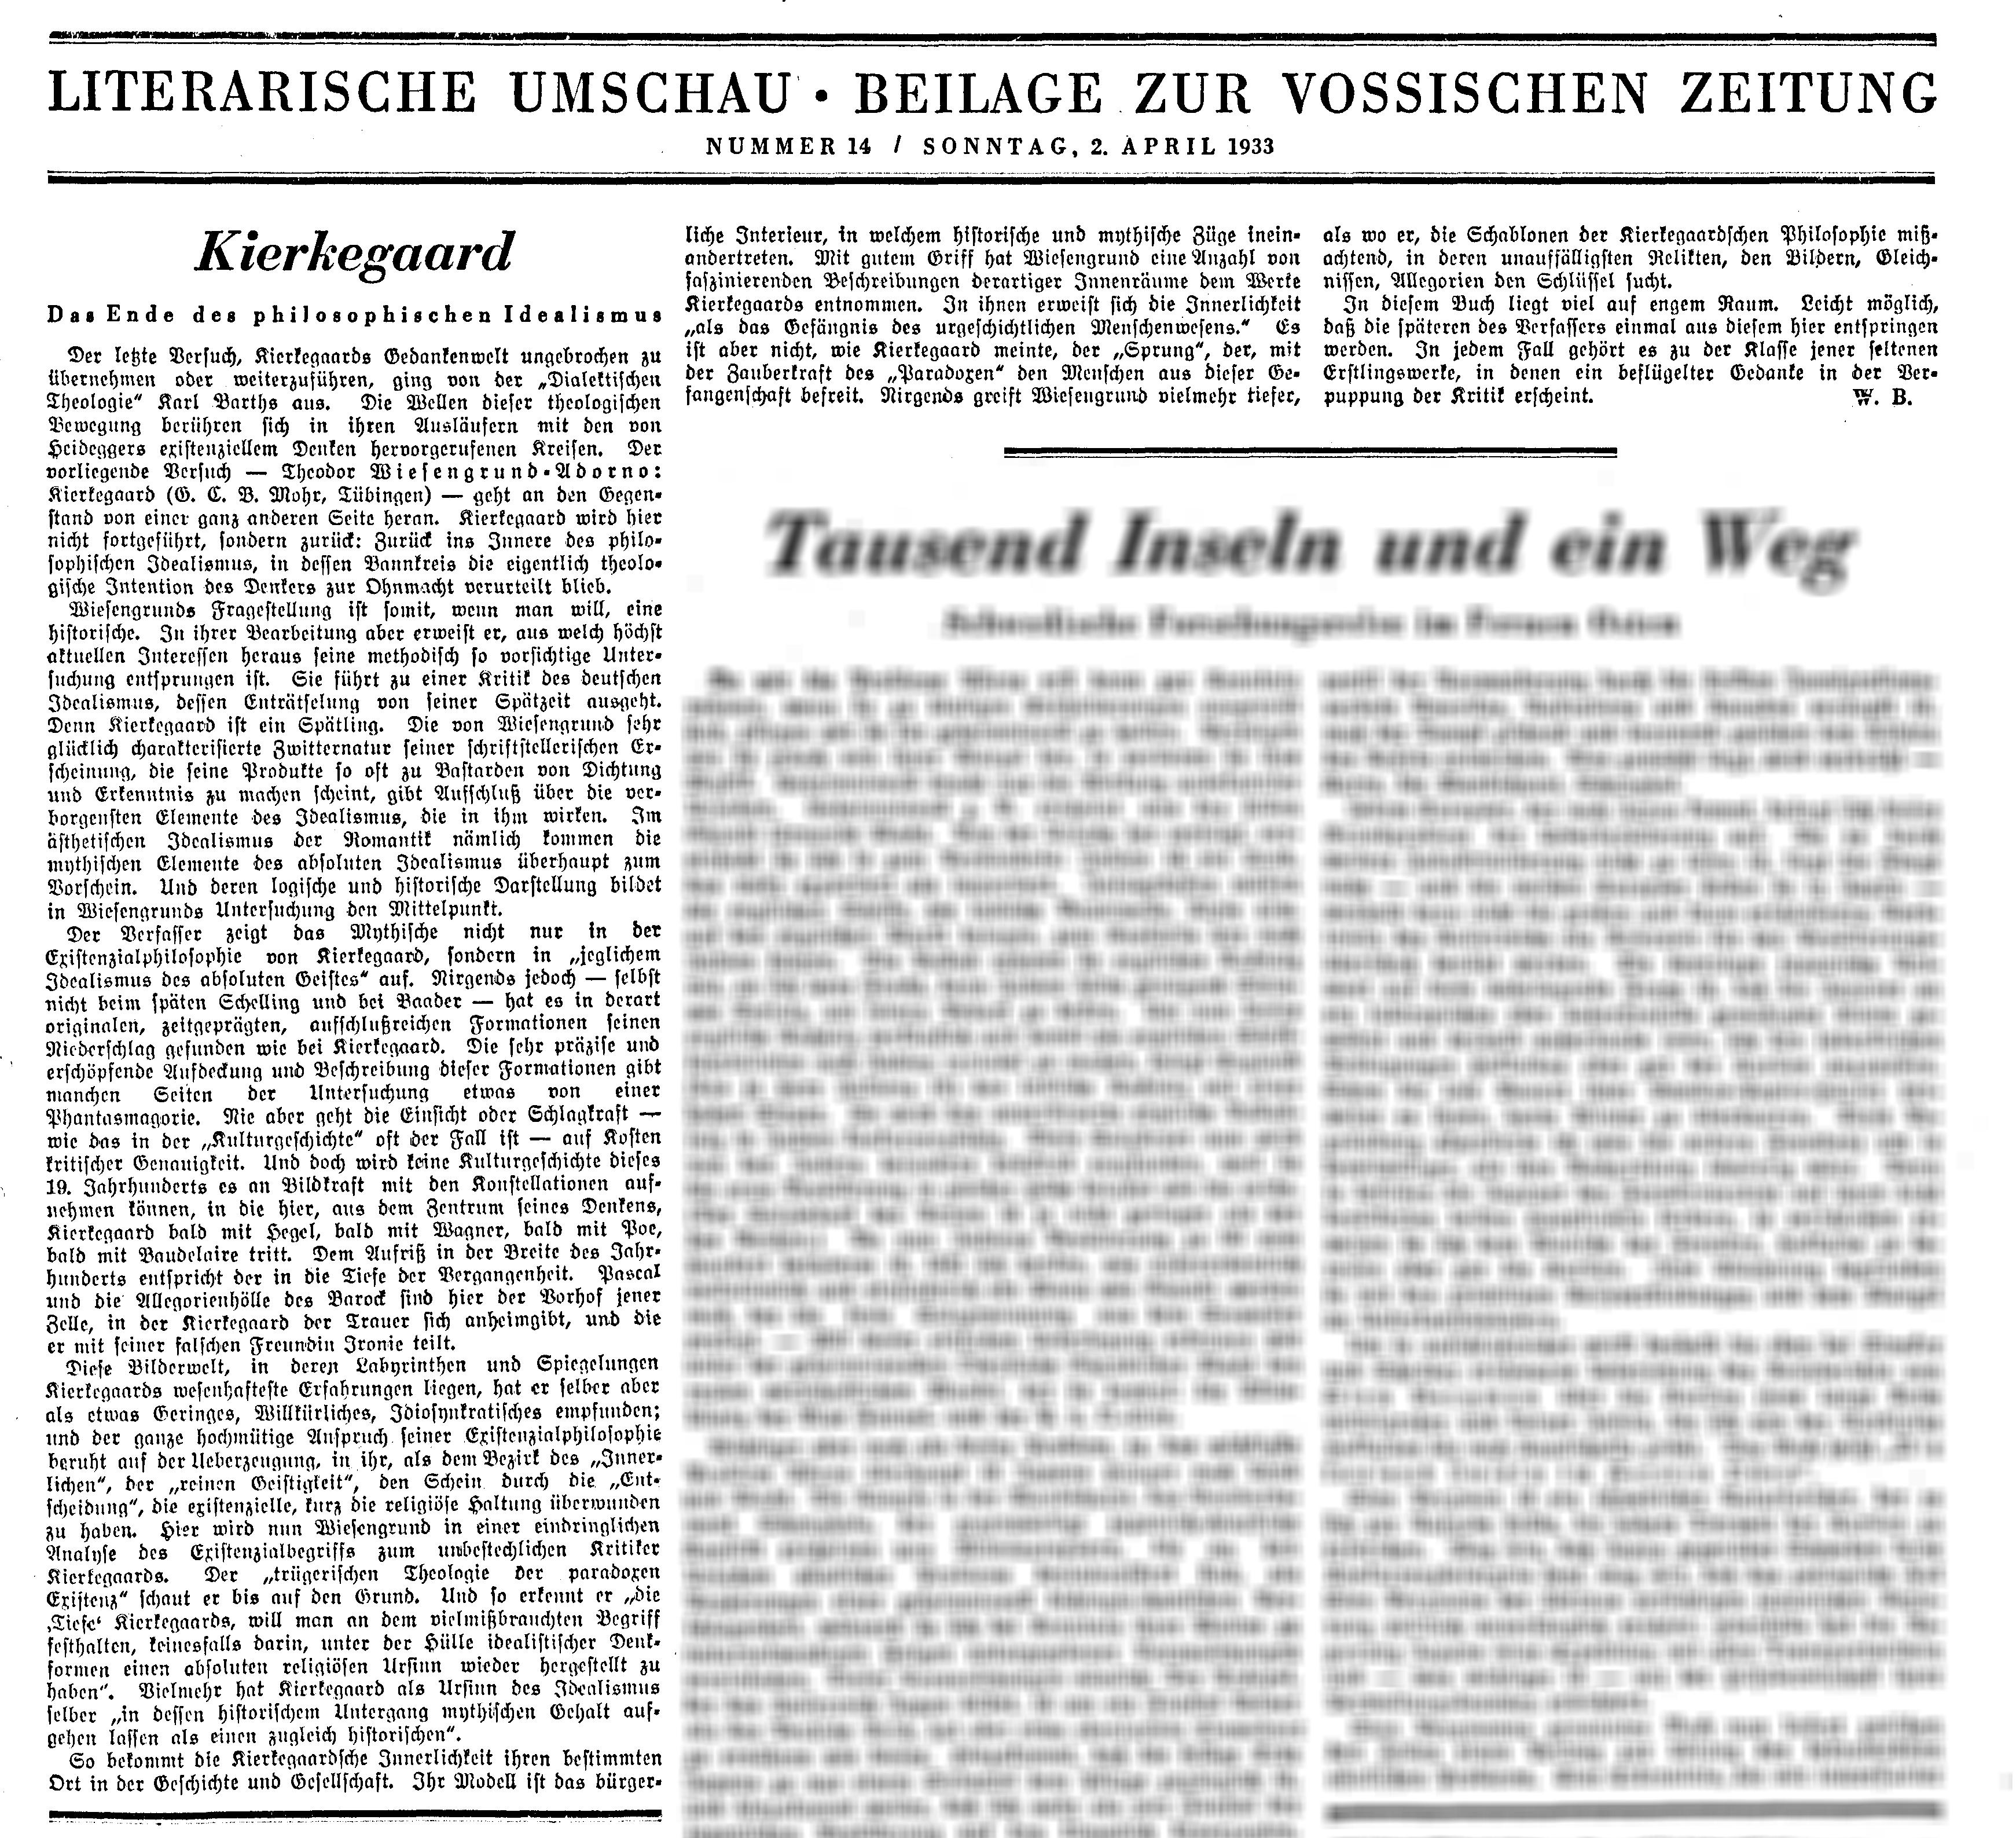 File:Kierkegaard-Vossische Zeitung-1933.png - PNG Zeitung